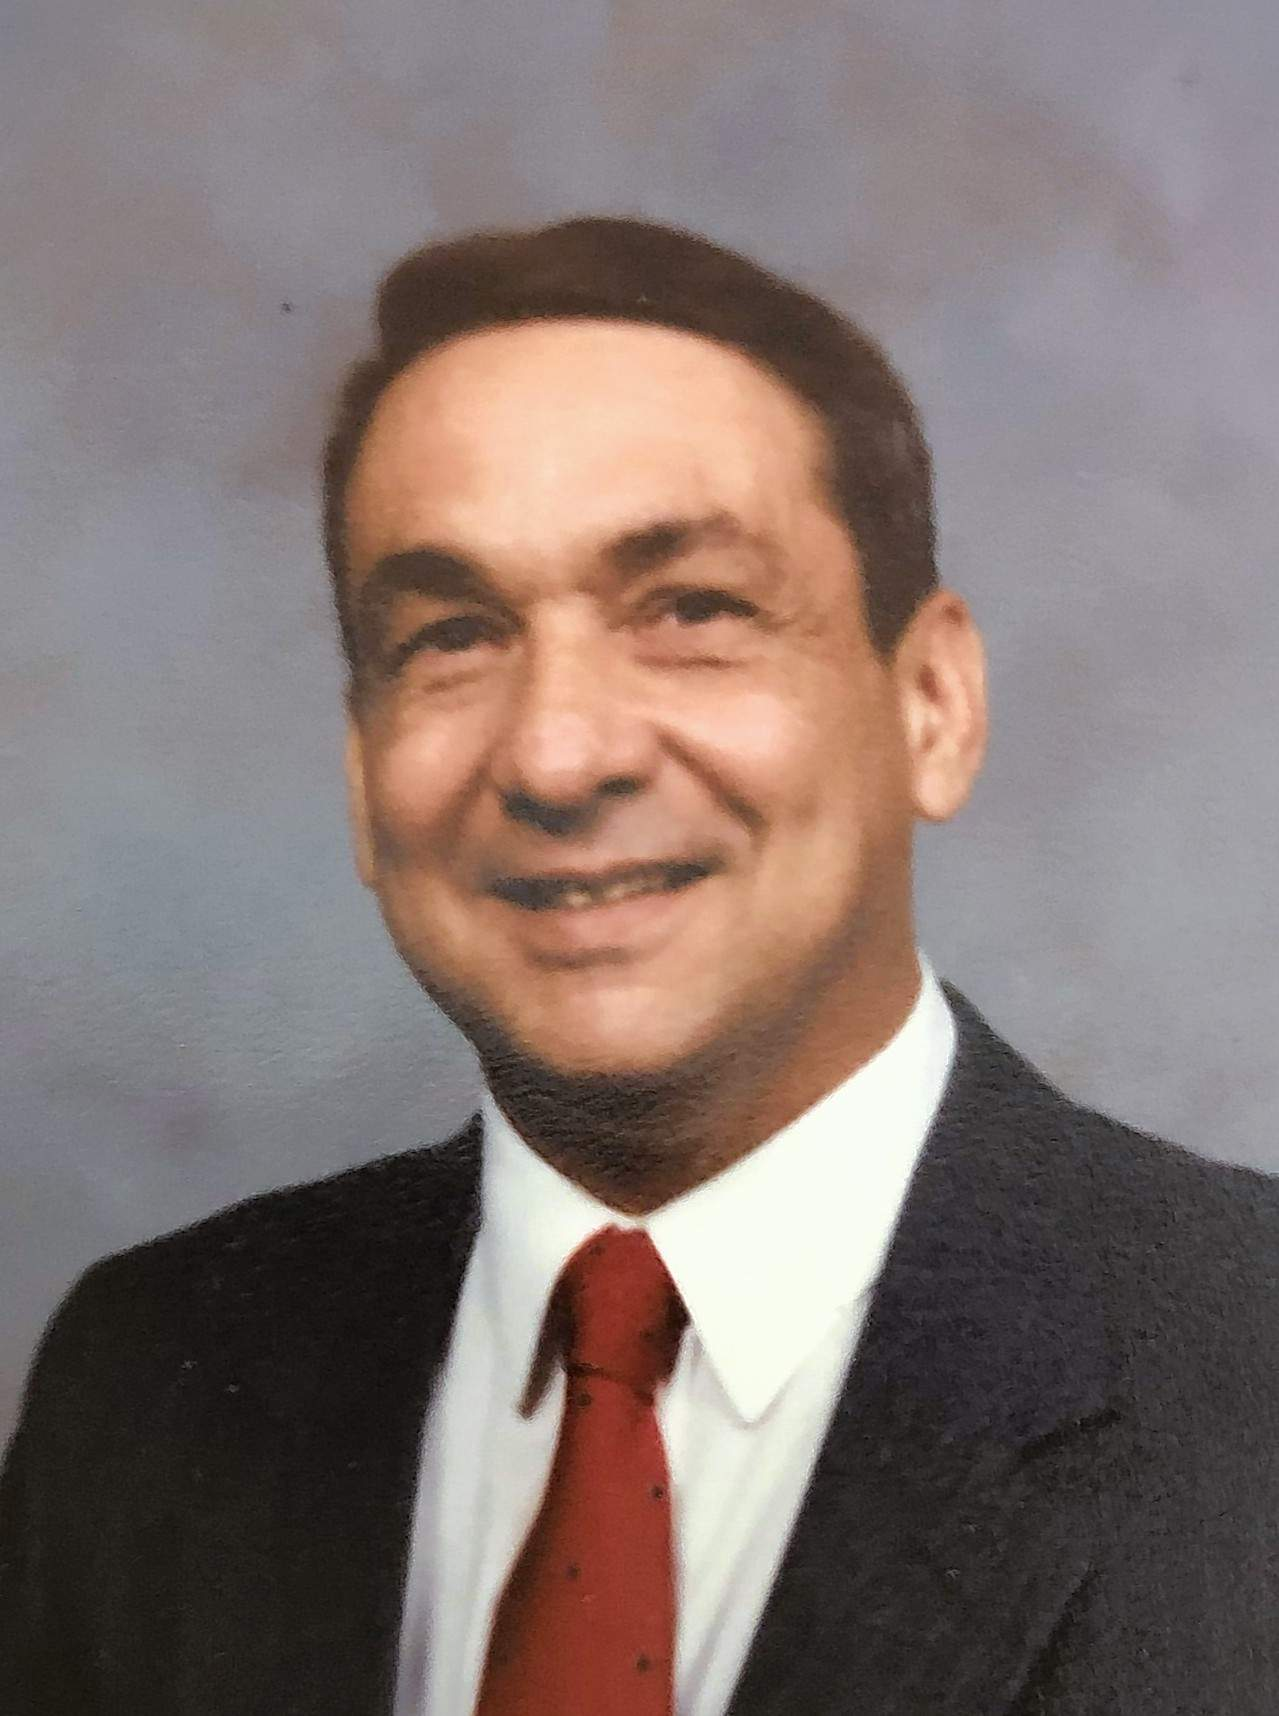 Dale R. Lochhead